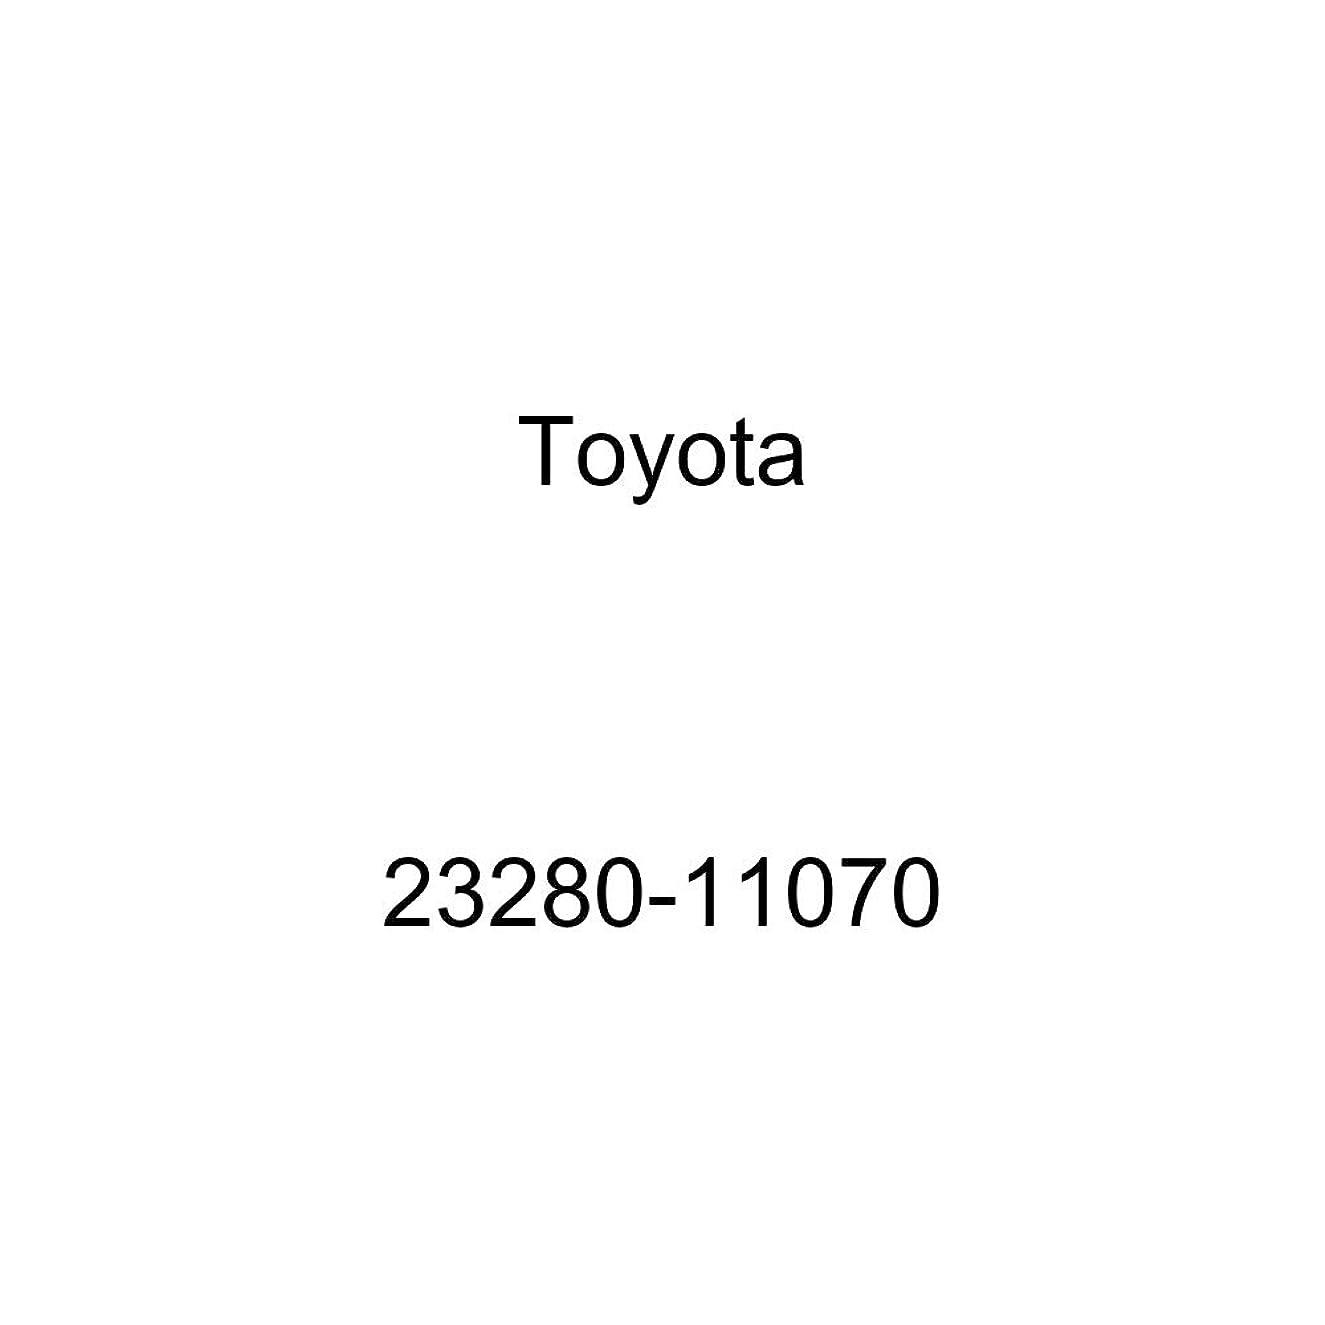 Toyota 23280-11070 Fuel Injection Pressure Regulator